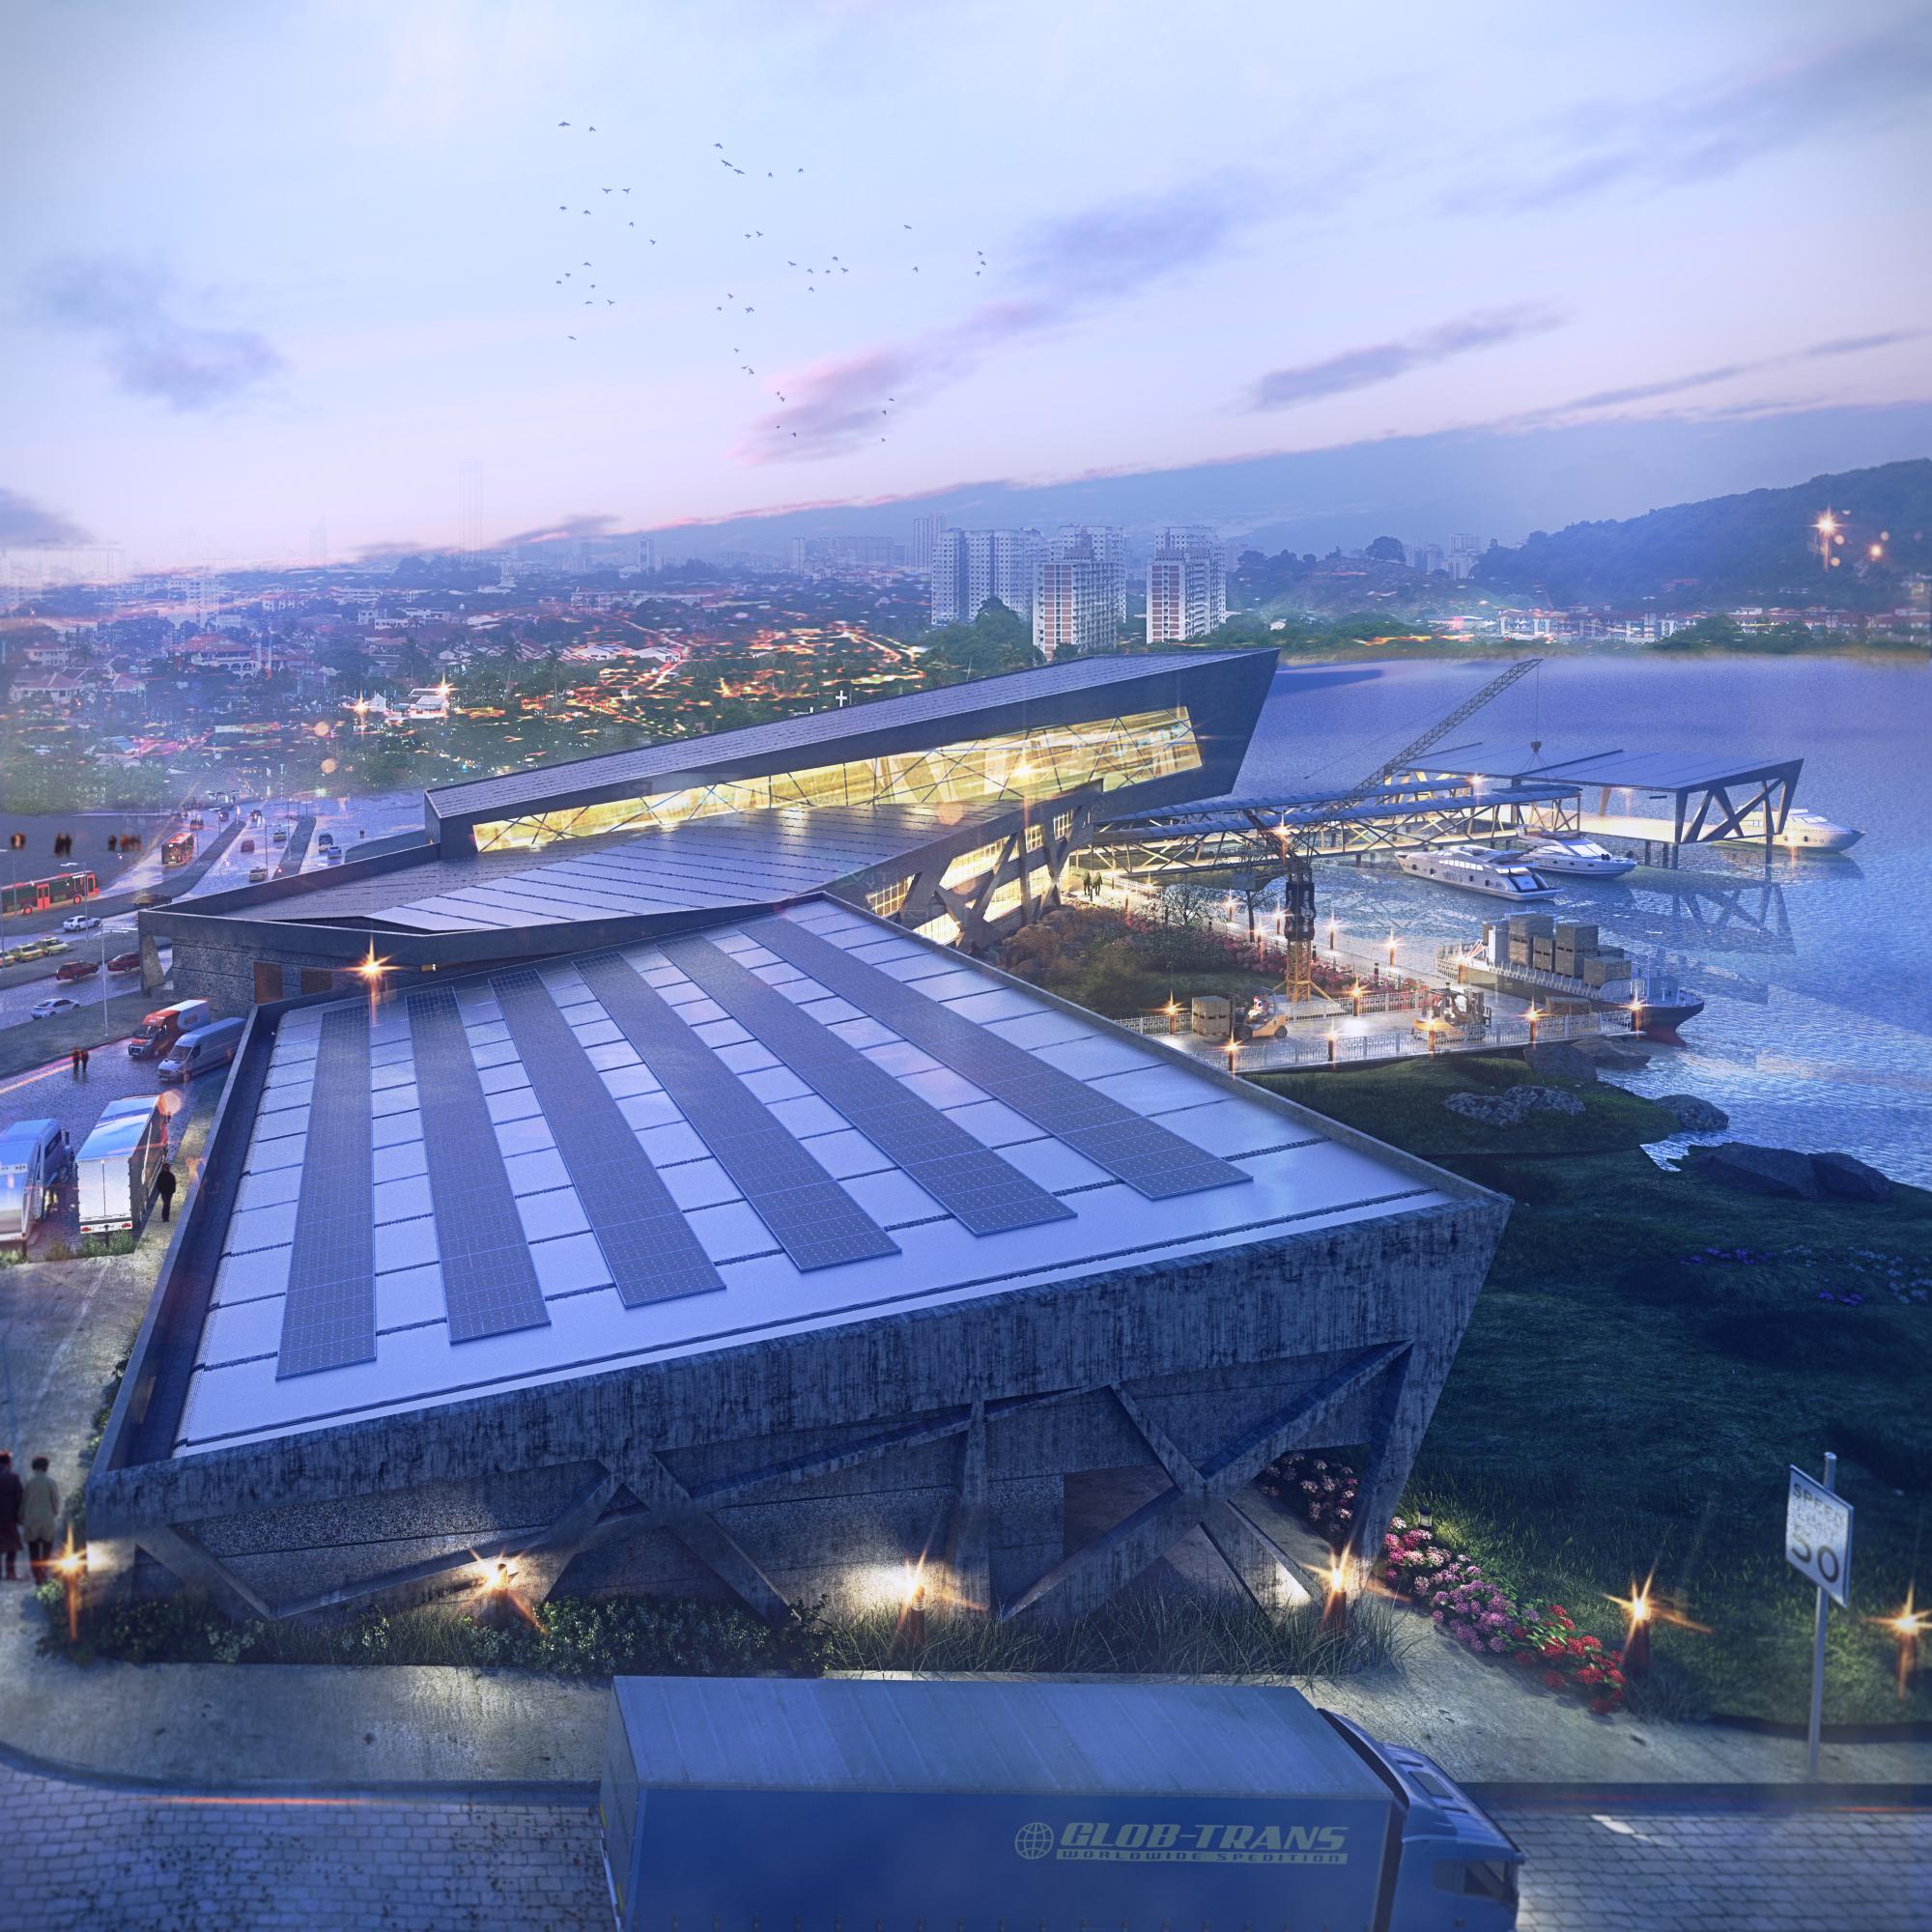 ijede-ferry-terminal-by-okolie-uchechukwu-10-cleec-design-2